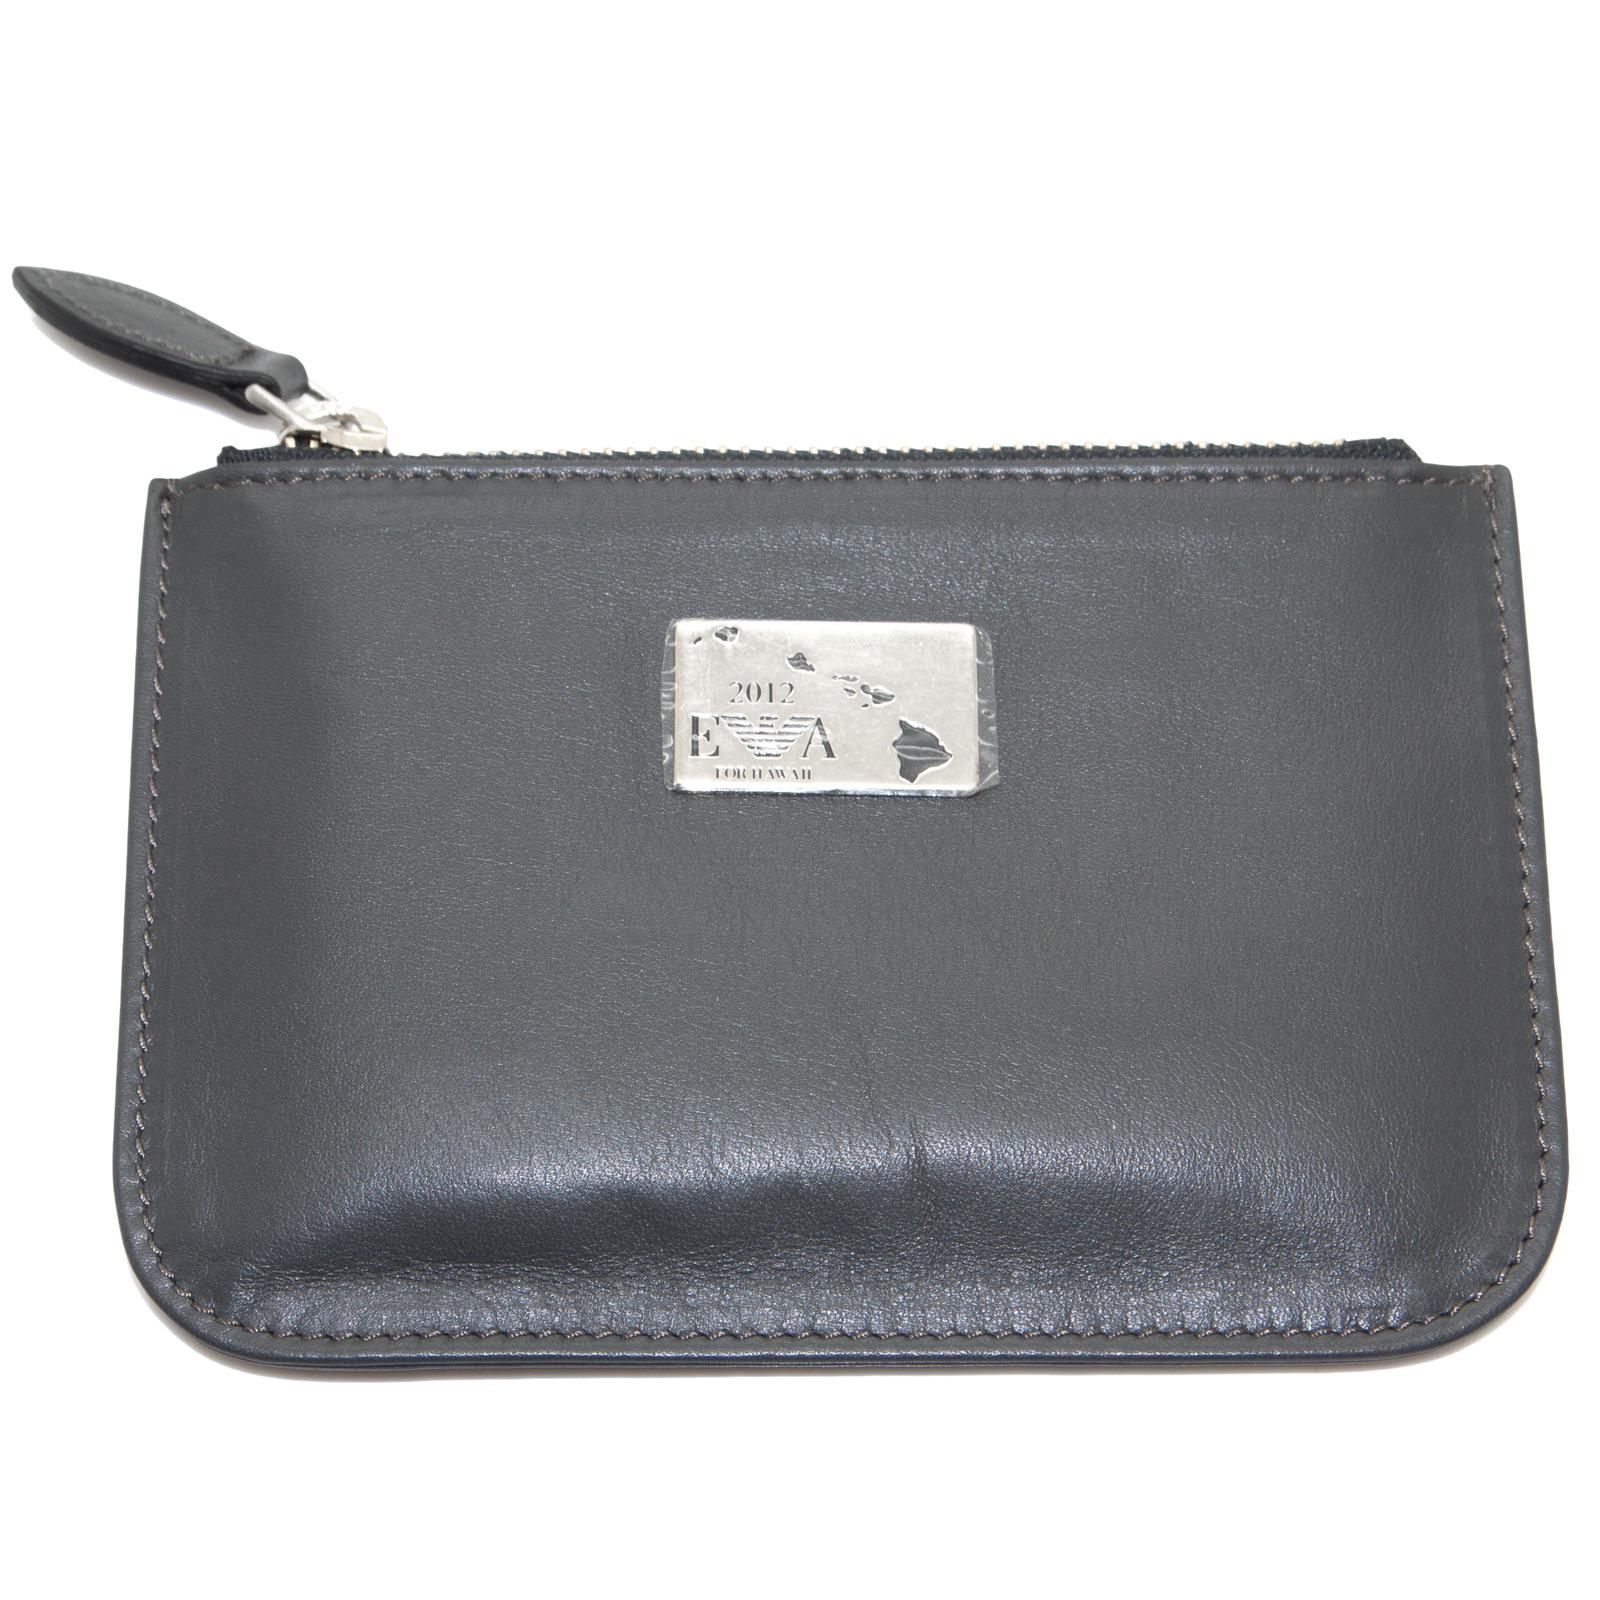 EMPORIO-ARMANI-Women-039-s-034-2012-034-Zip-Top-Coin-Purse-Wallet-YEMG99-195-NWT thumbnail 5